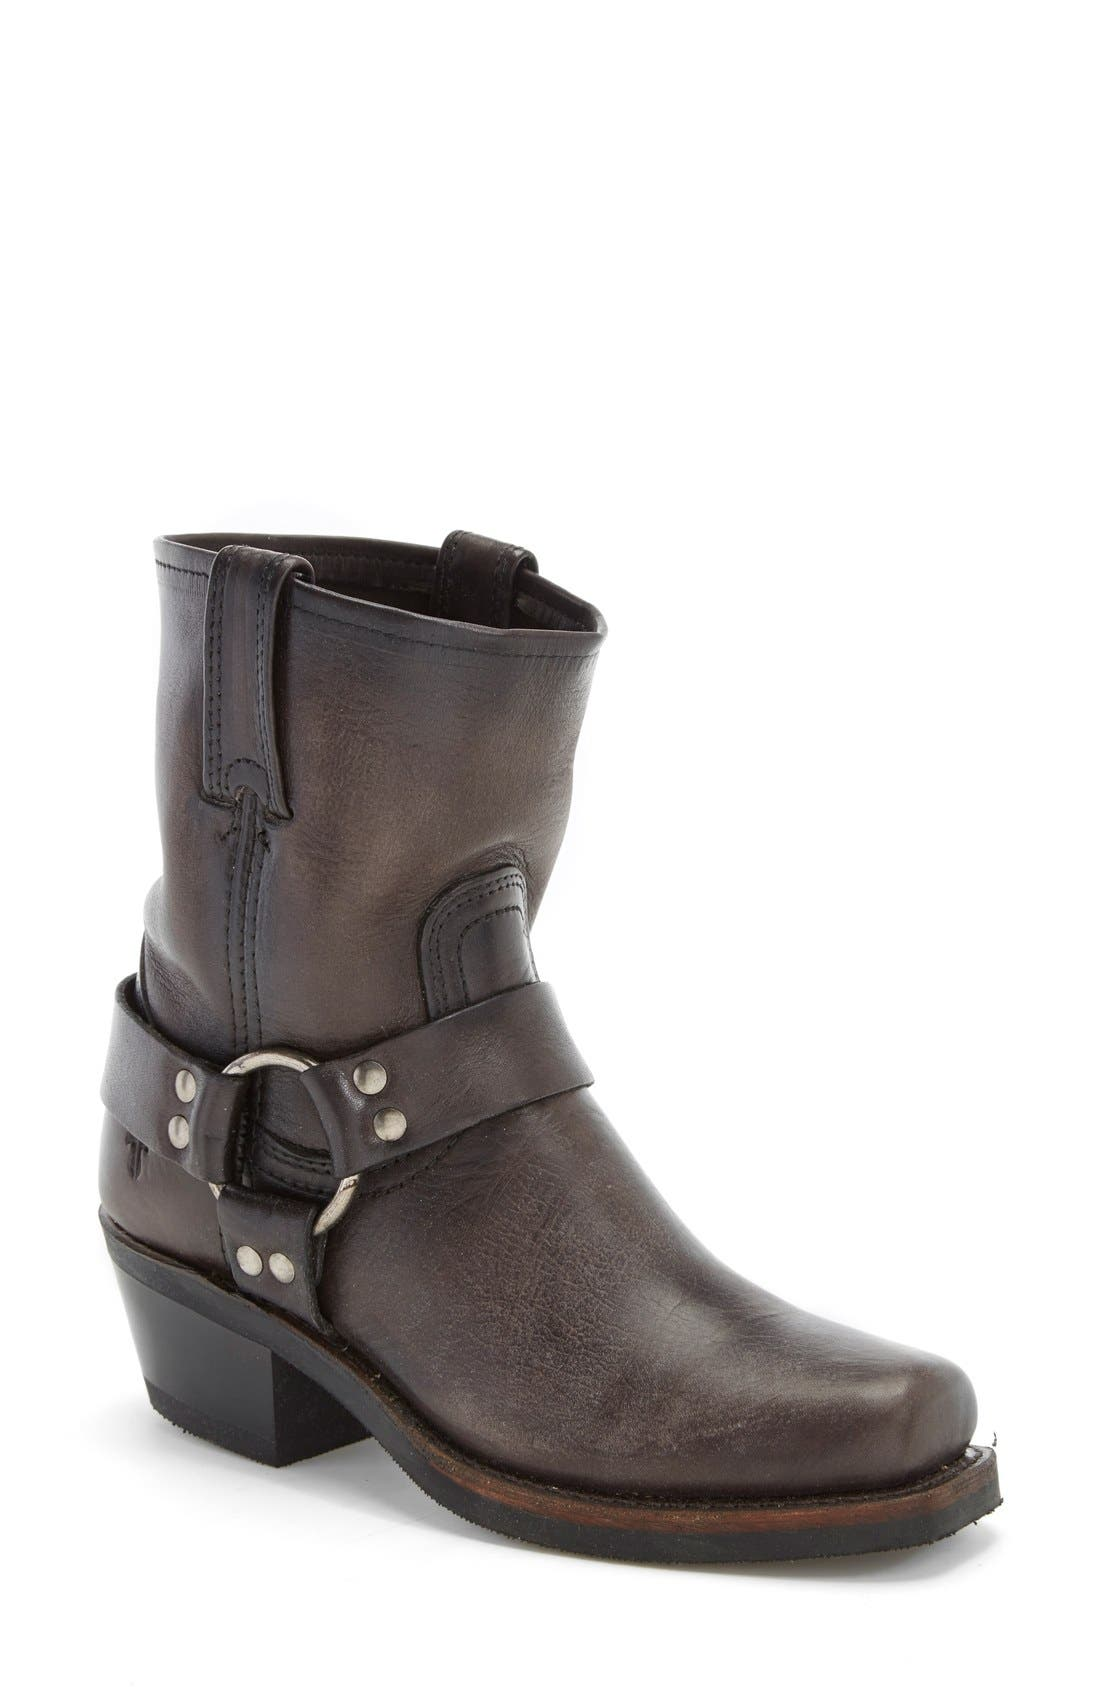 Alternate Image 1 Selected - Frye 'Harness 8R' Boot (Women)